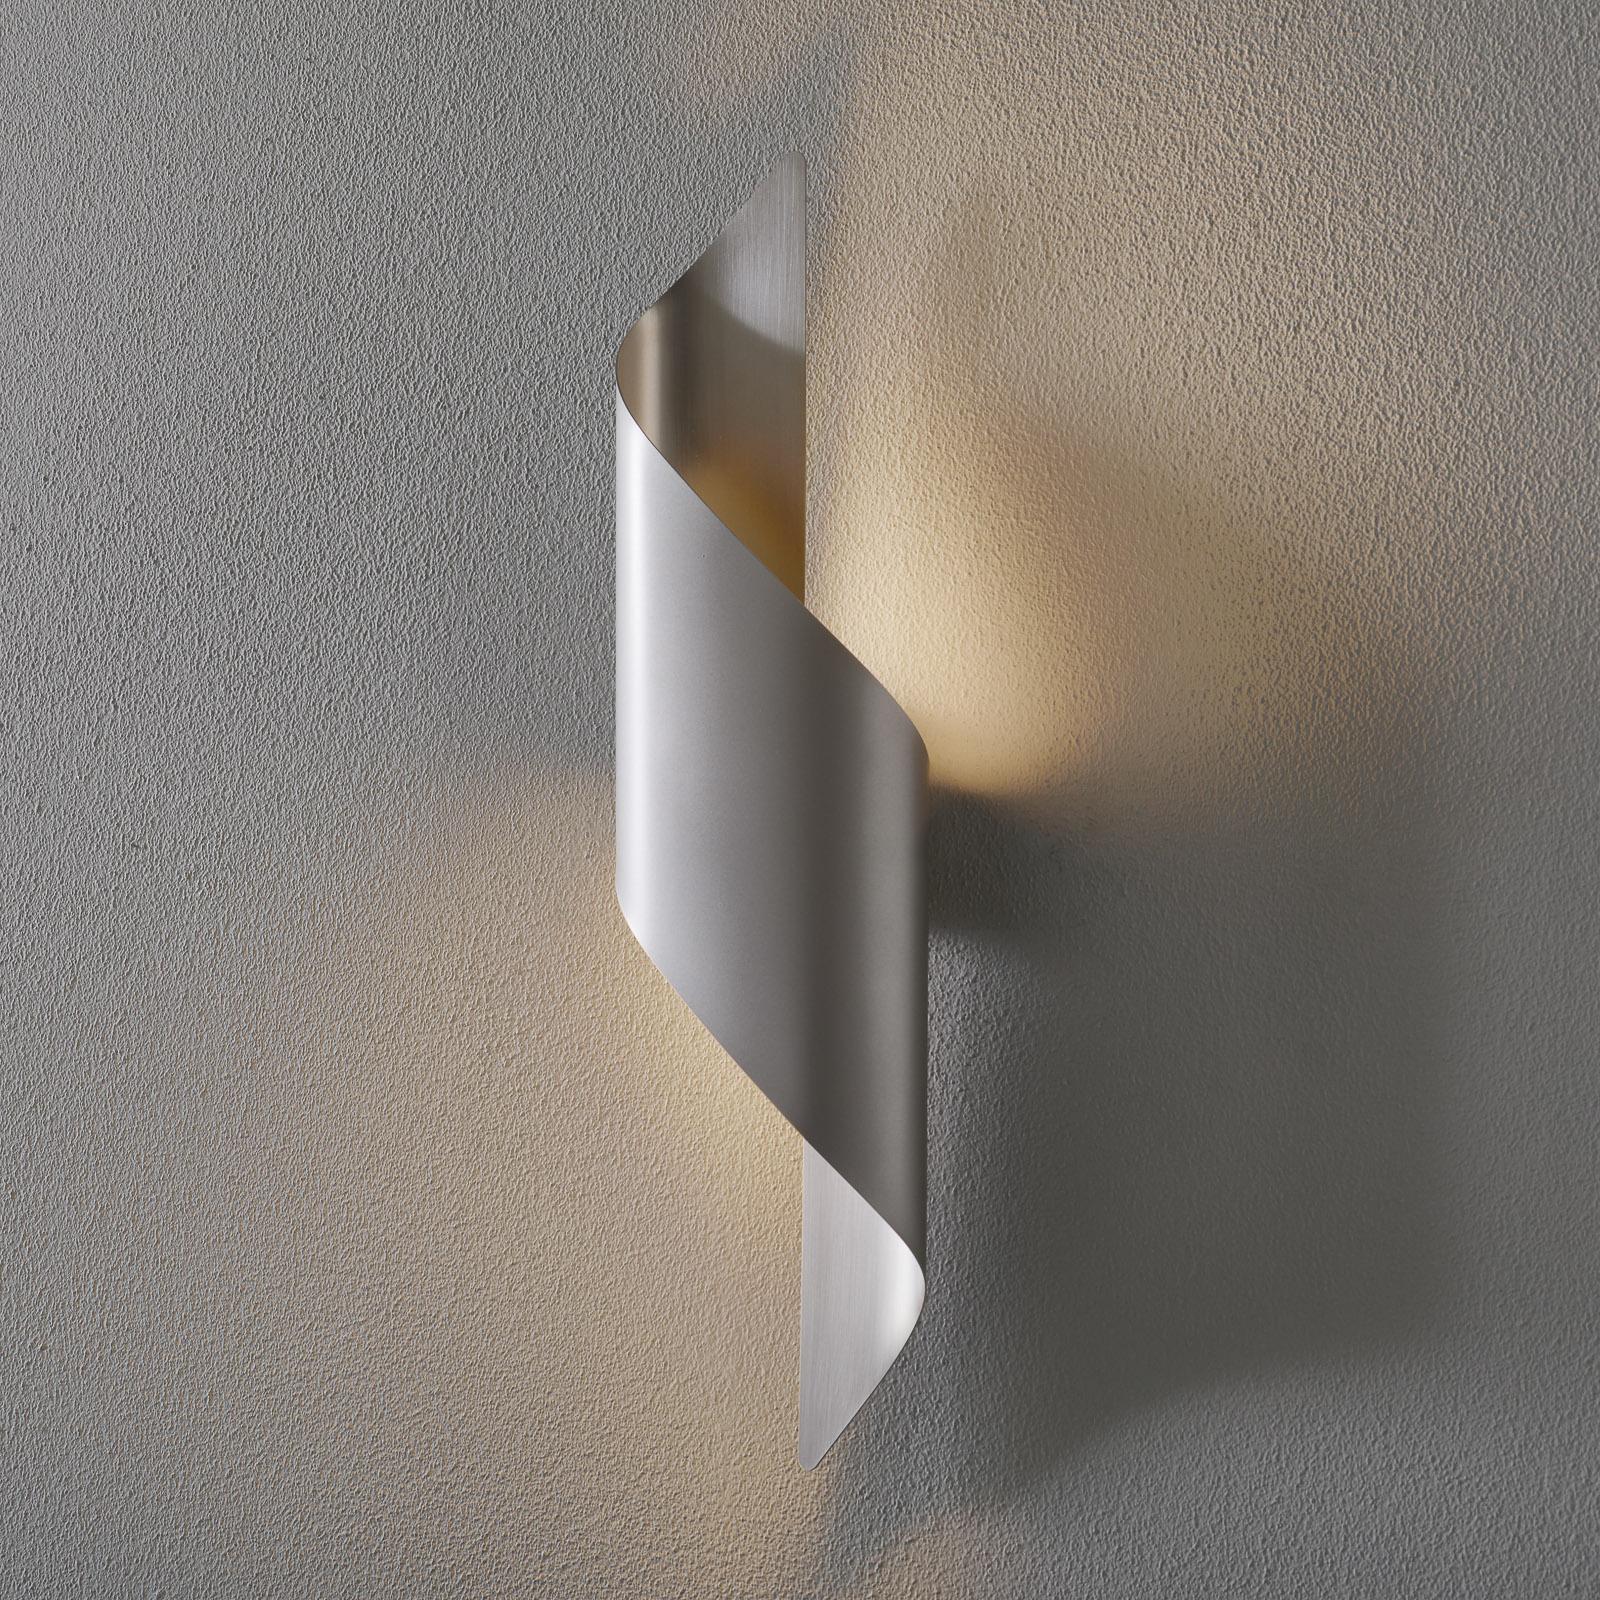 LED-Wandleuchte Fanes, 50 cm hoch, perlgrau